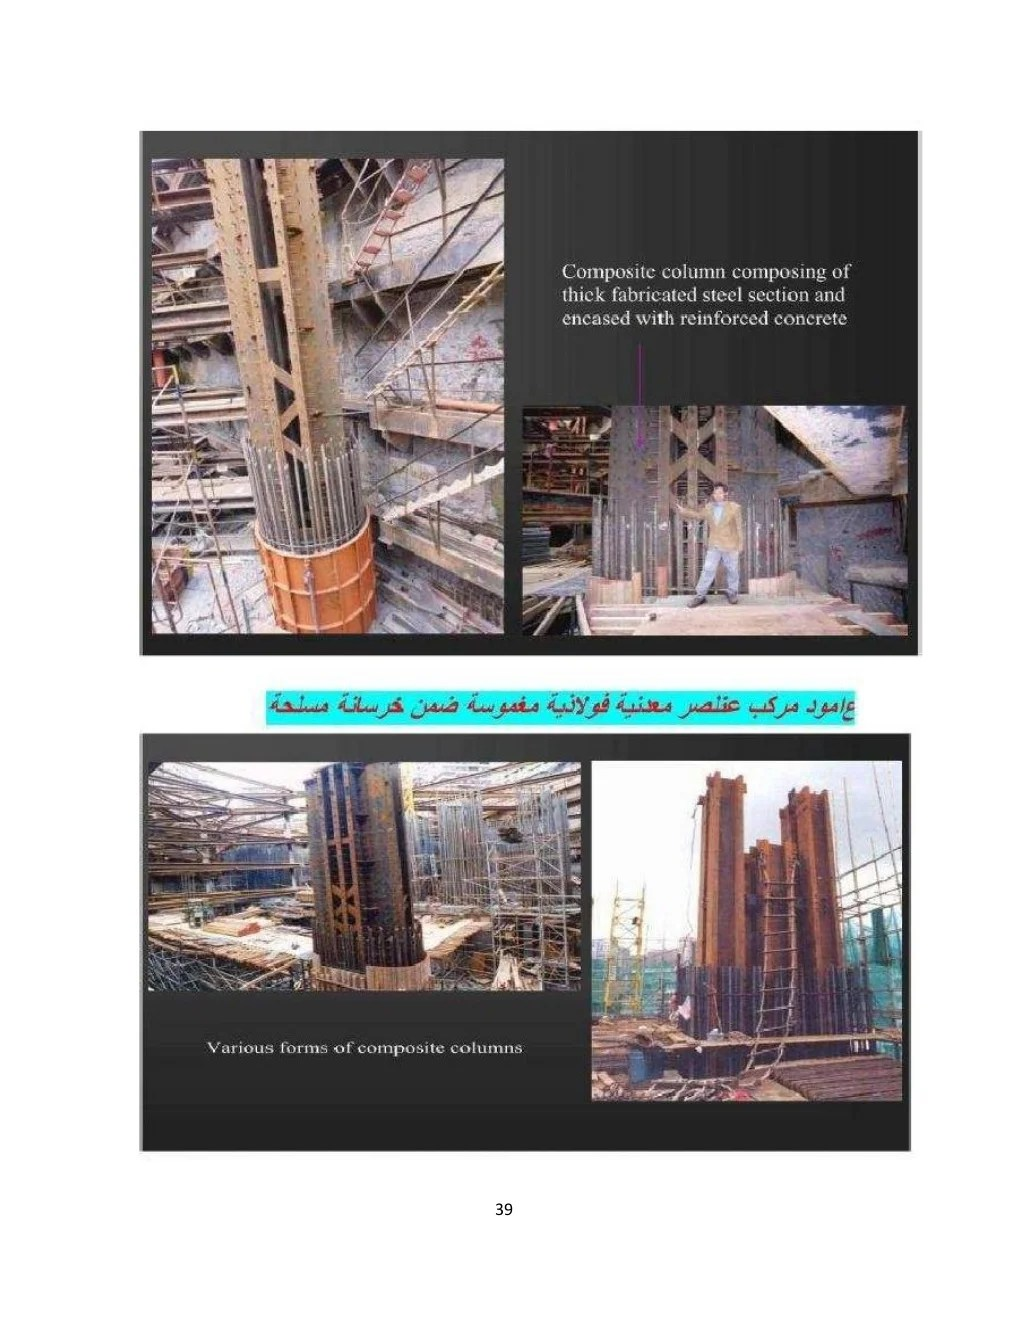 seismic-design-of-composite-shear-walls-frames-39-1024.jpg